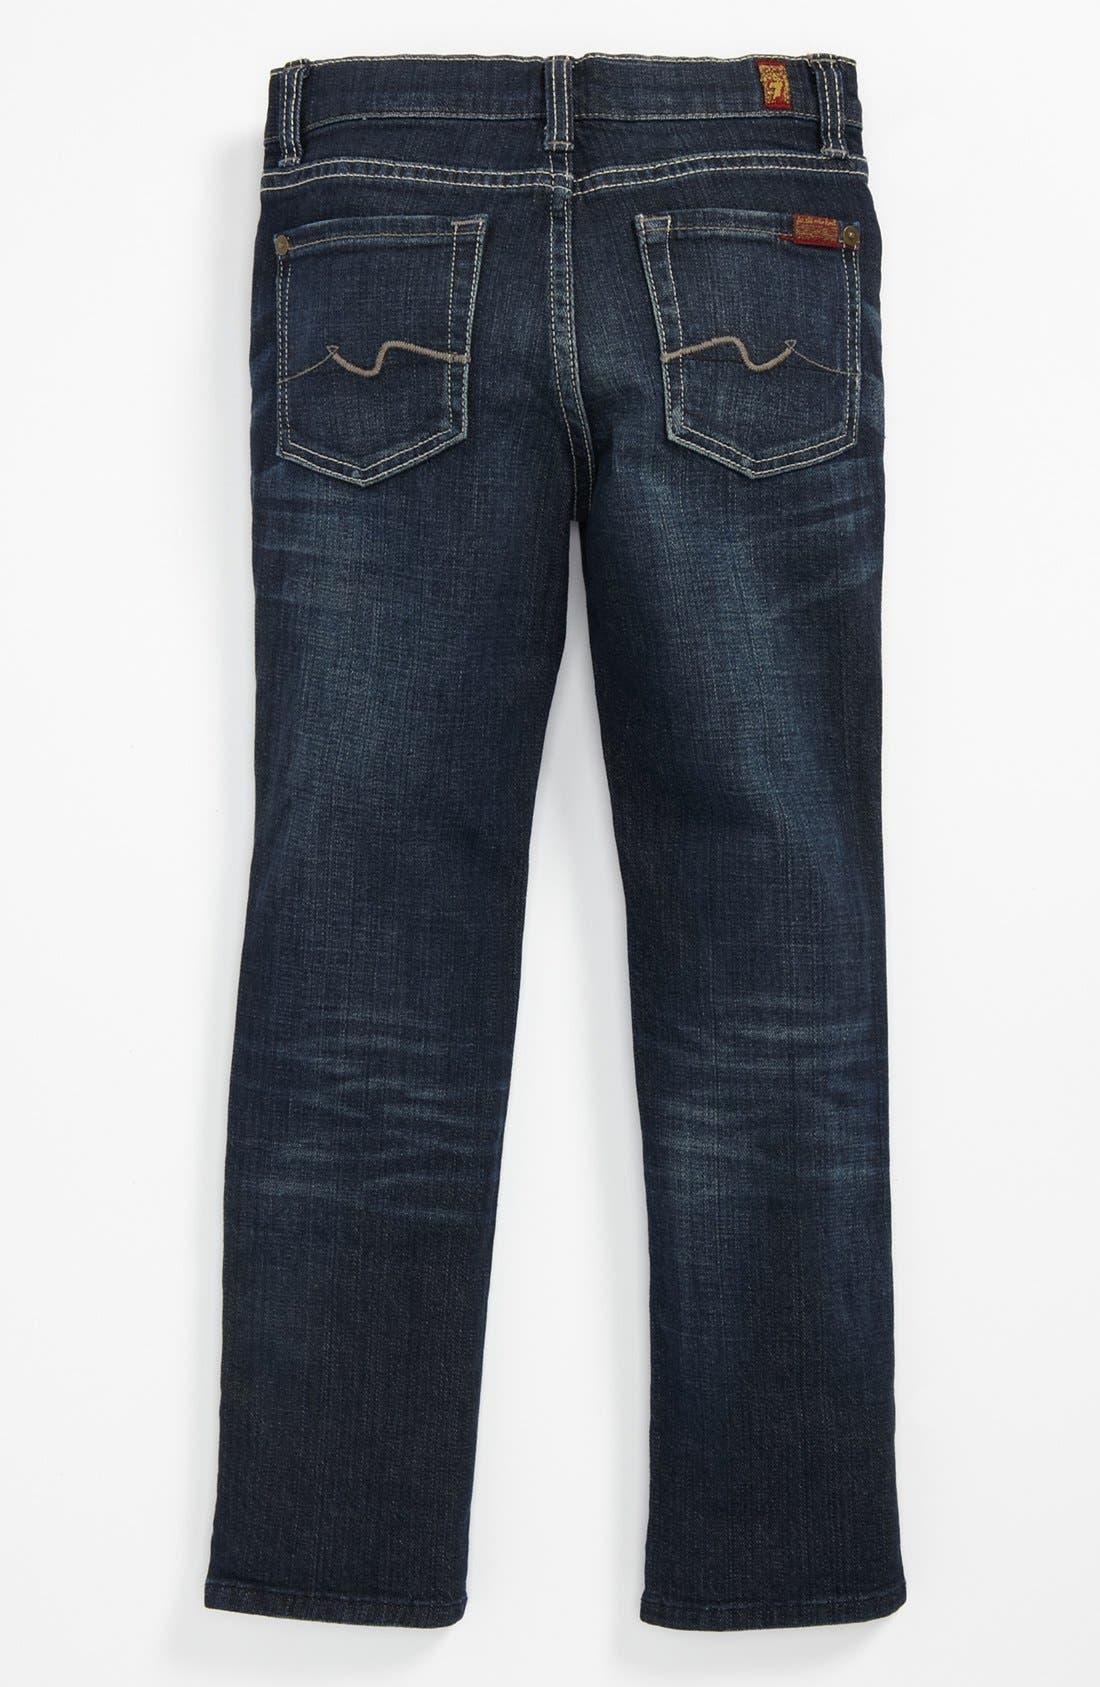 Main Image - 7 For All Mankind® 'Slimmy' Slim Straight Leg Jeans (Little Boys & Big Boys)